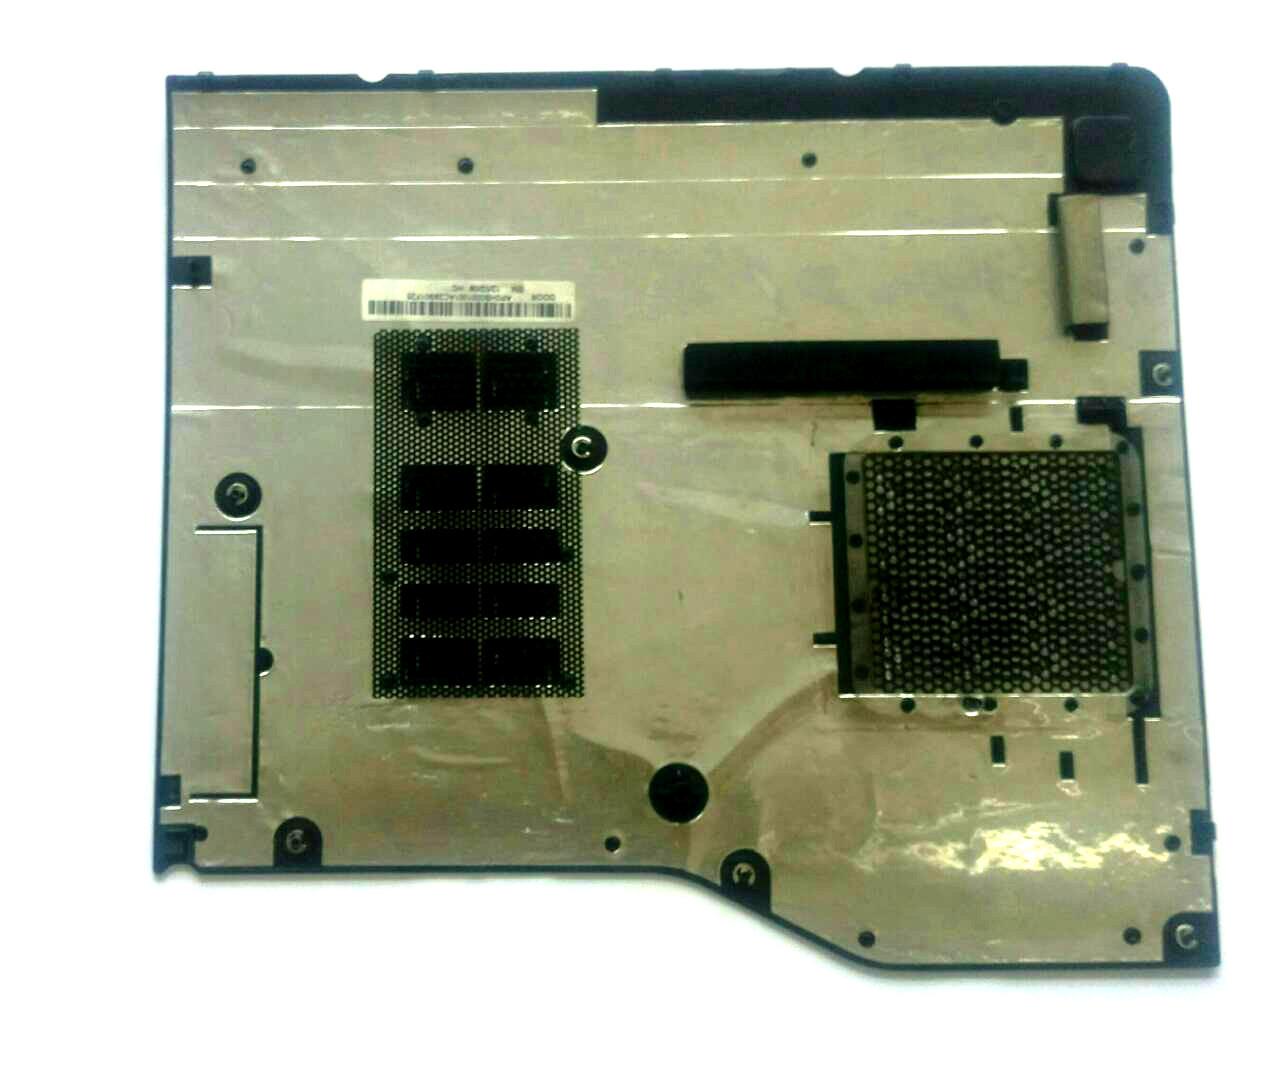 Крышка (заглушка) нижней части корпуса ноутбука Lenovo Y570